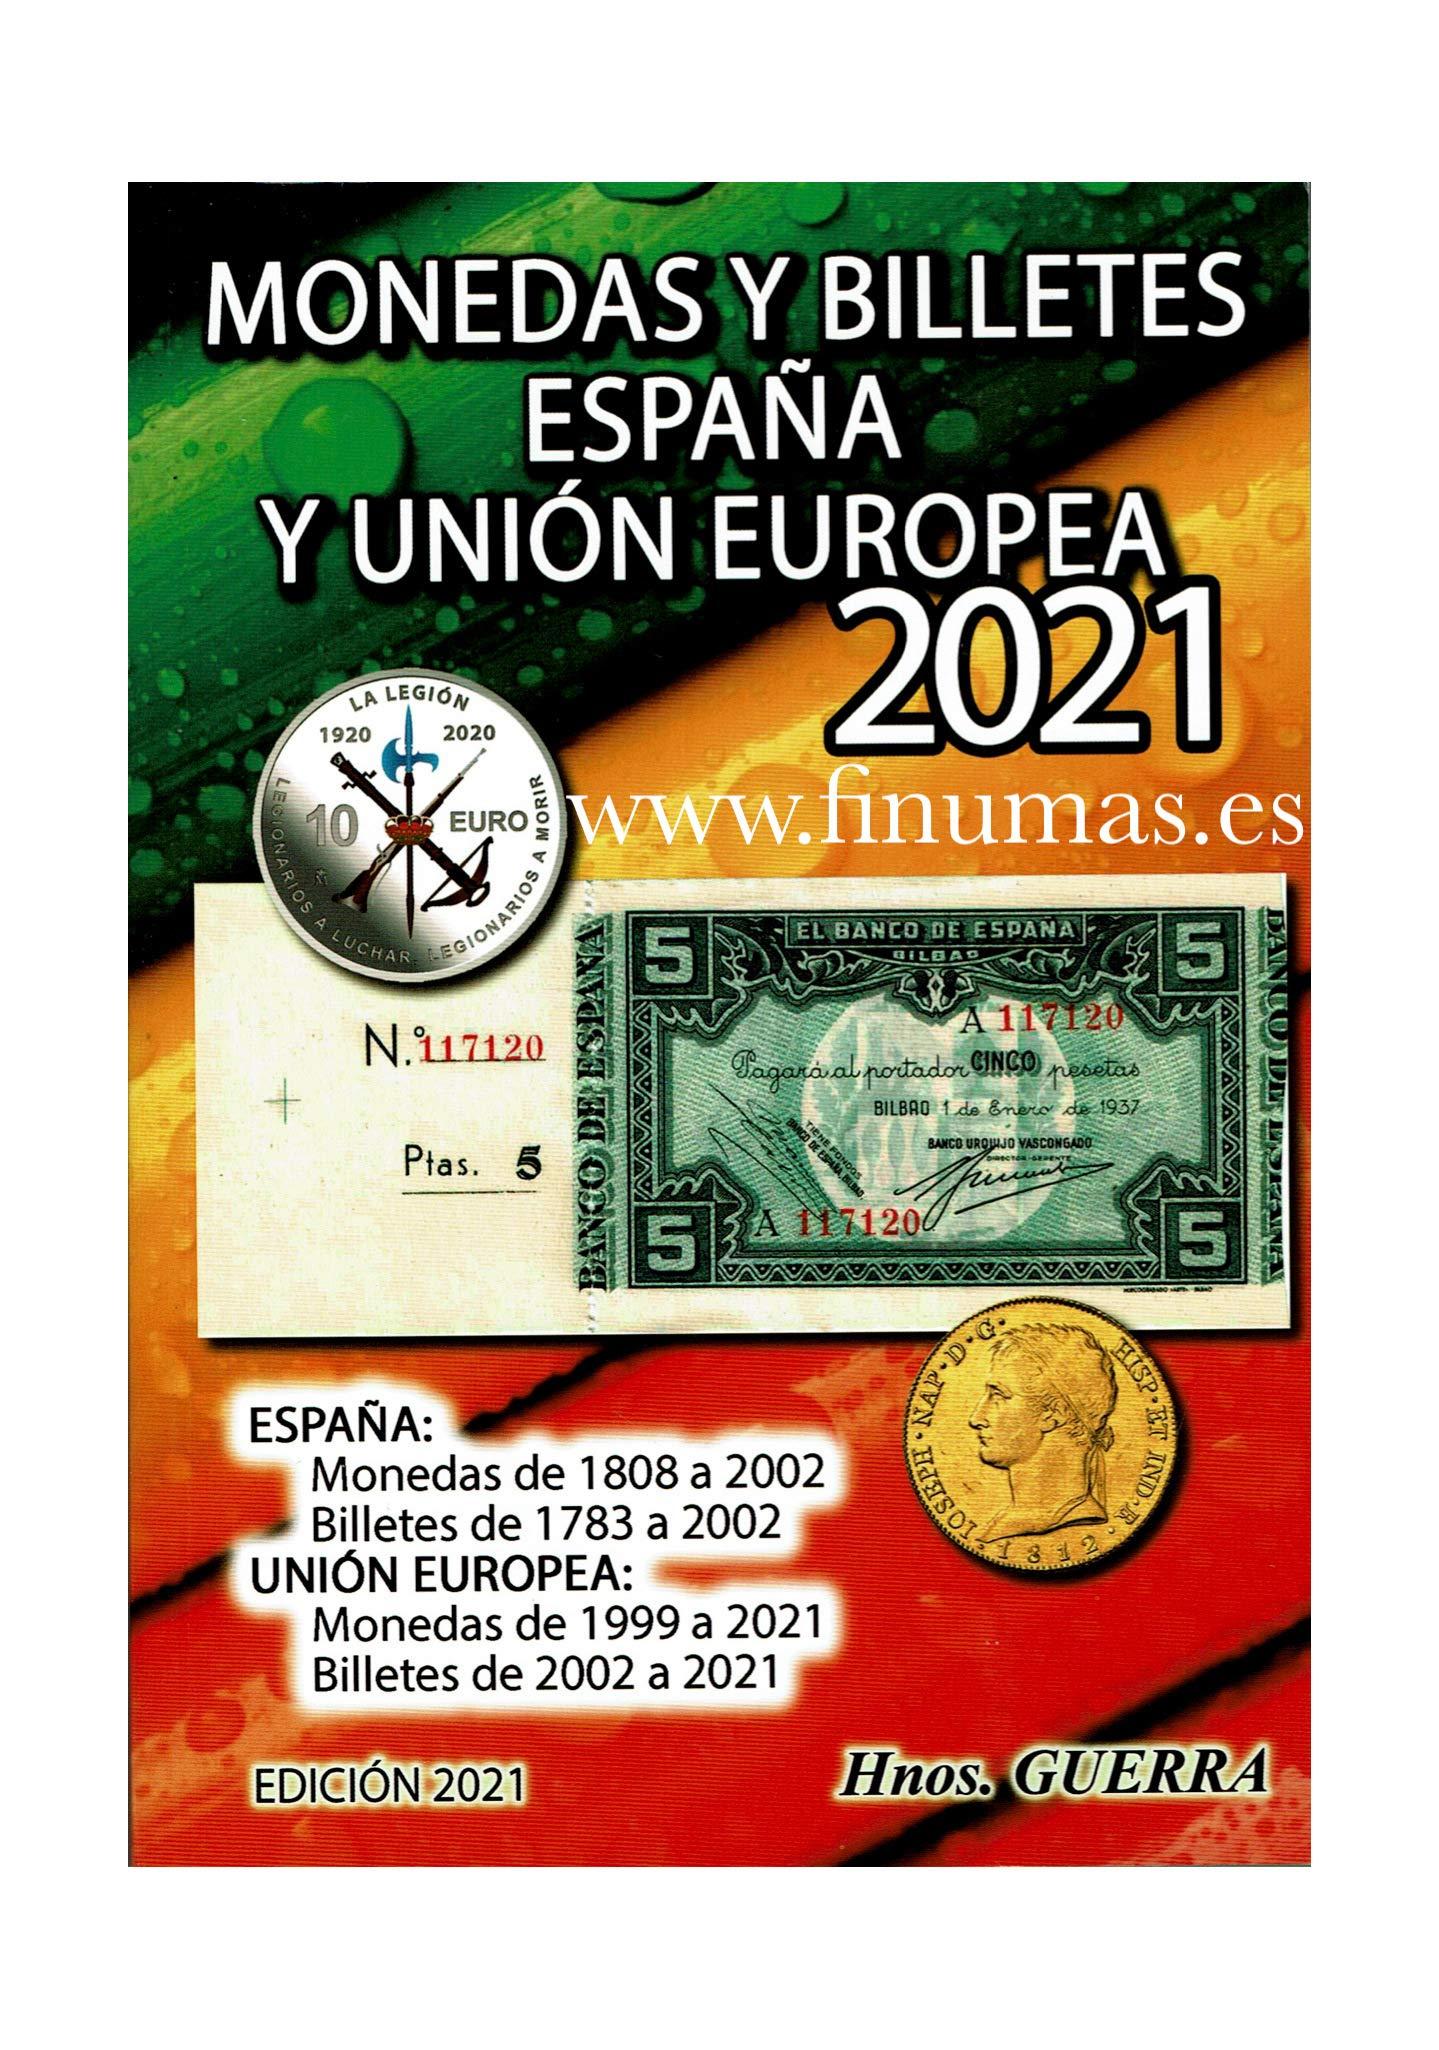 Catalogo Monedas y Billetes España. Edición 2021: Amazon.es: Hnos. Guerra: Libros